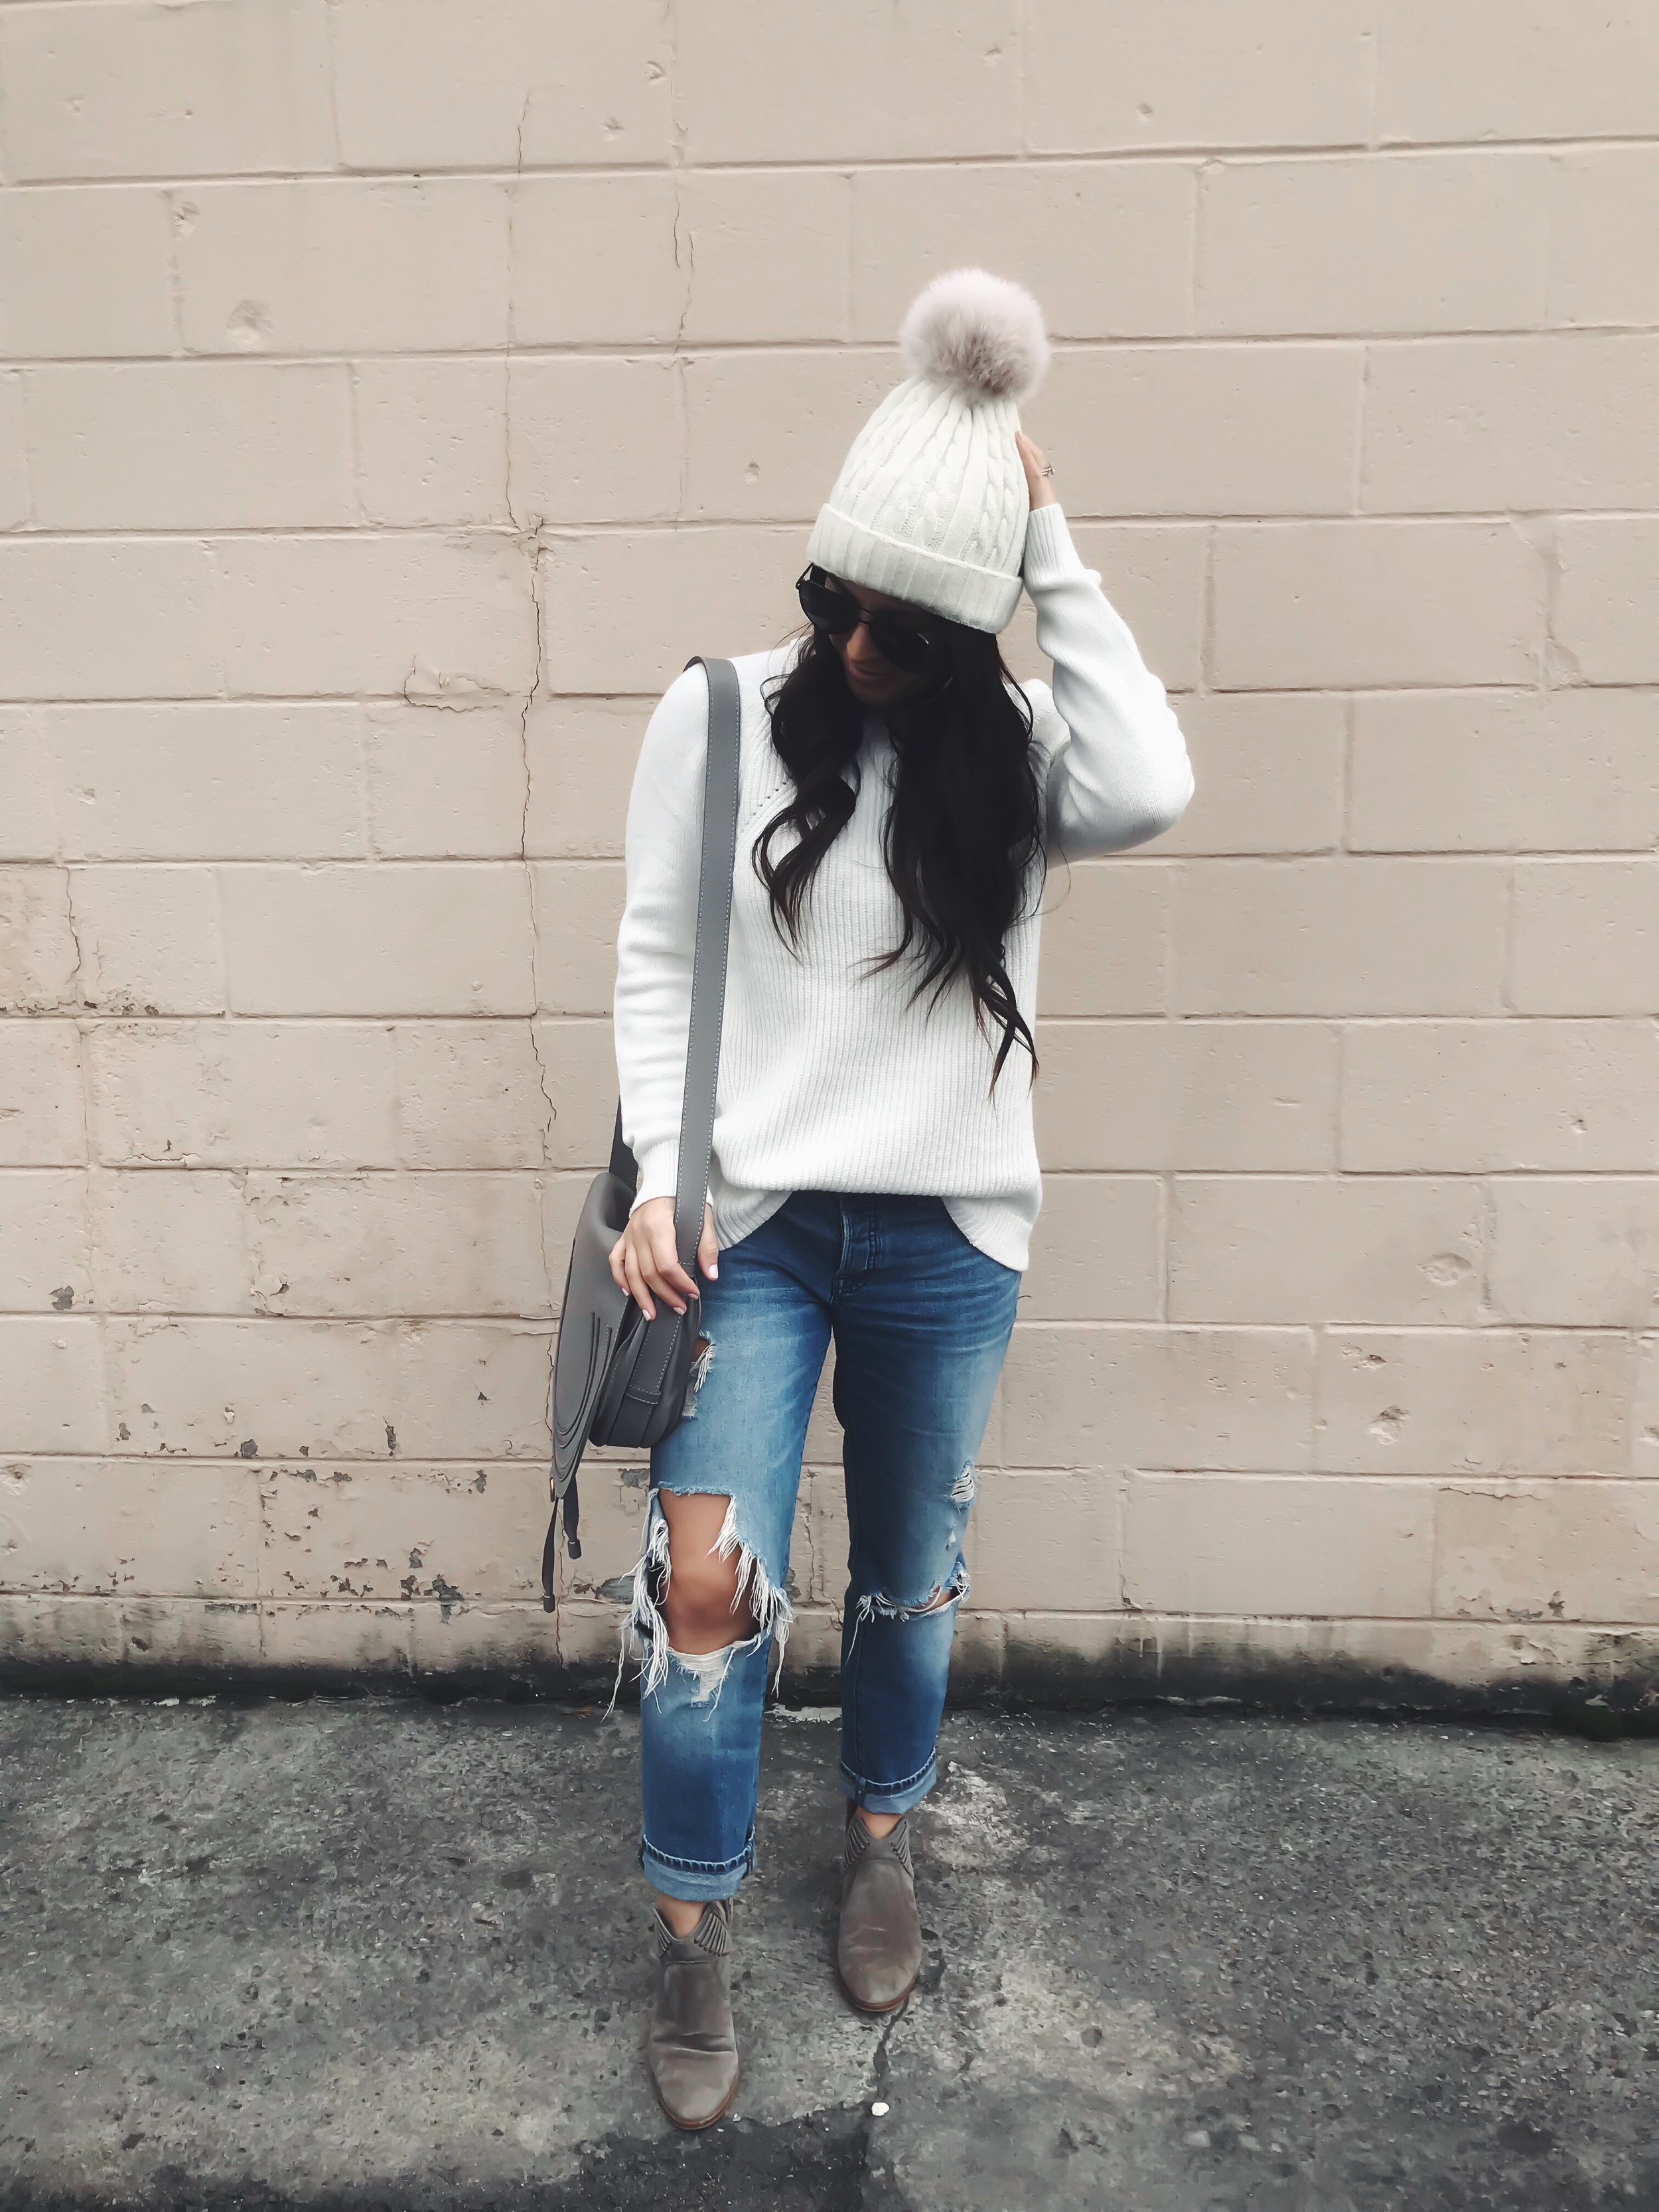 The Best Black Friday Sales of 2018 | Pine Barren Beauty | loft sweater, Abercrombie distressed boyfriend jeans, Vince camuto booties